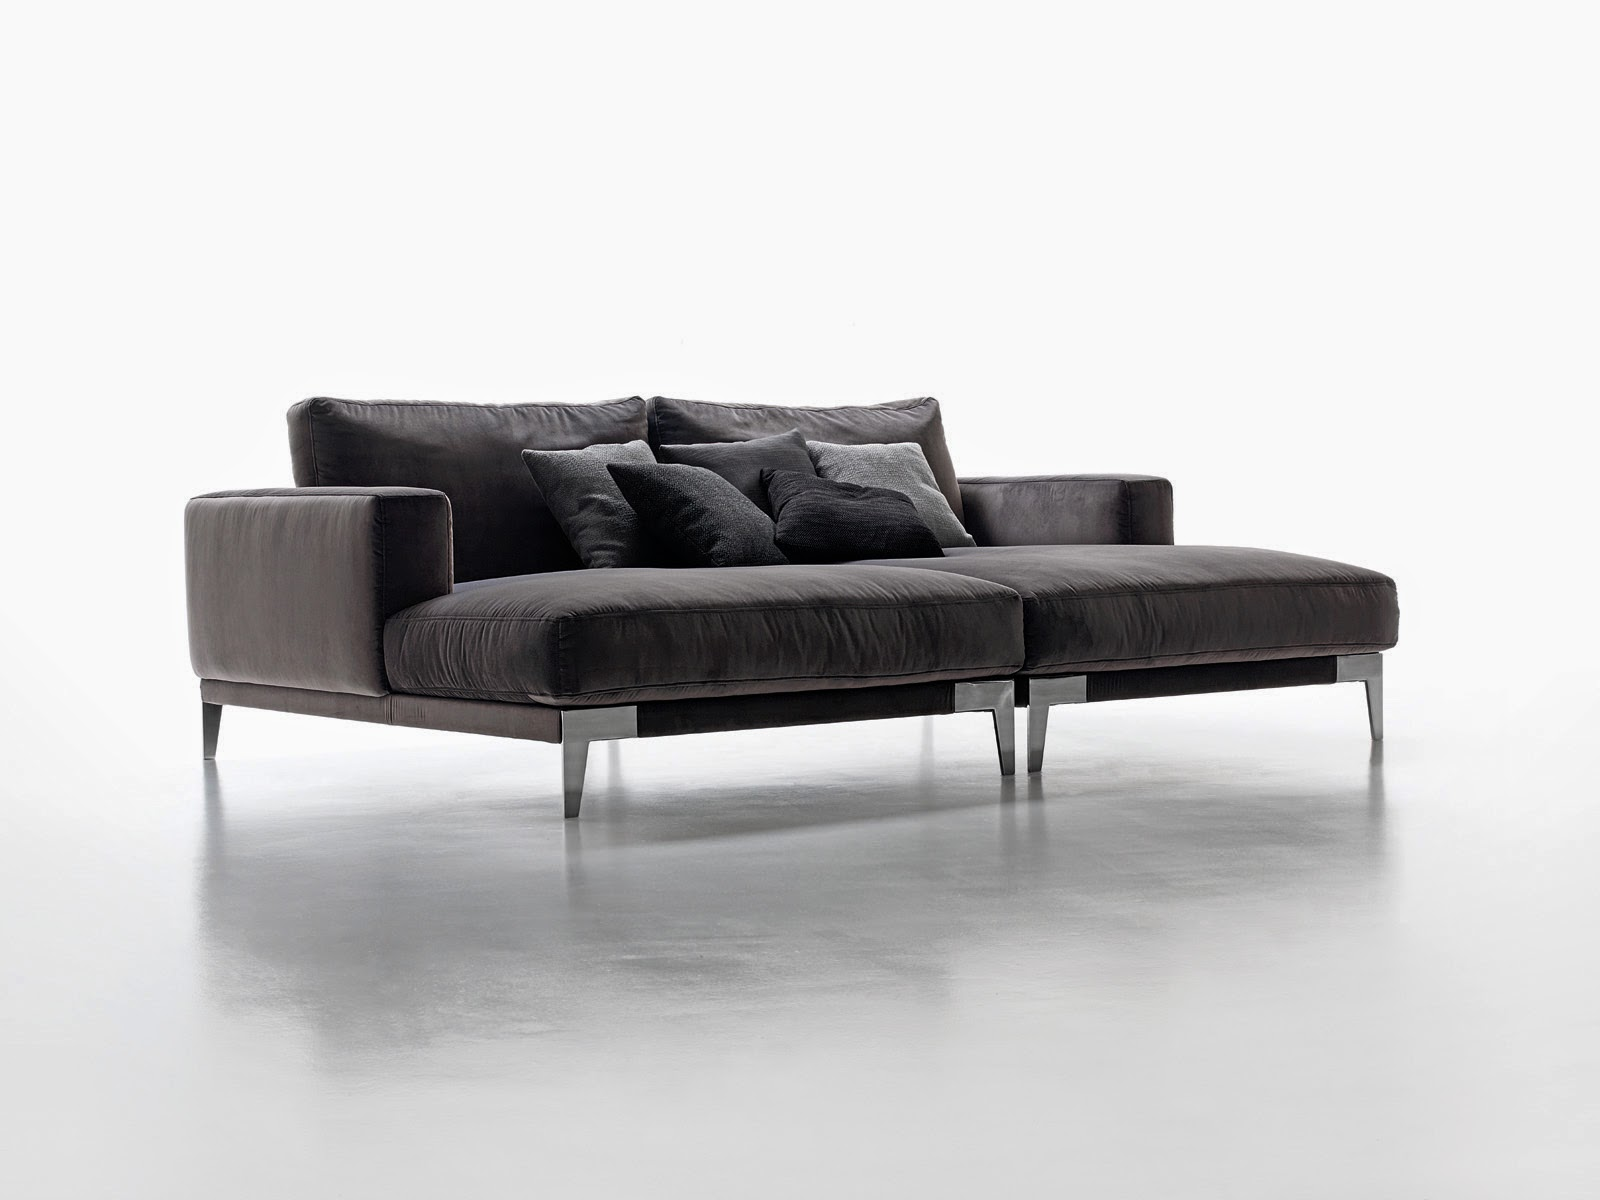 Divani blog tino mariani divani e chaise longue - Chaise longue modernos ...